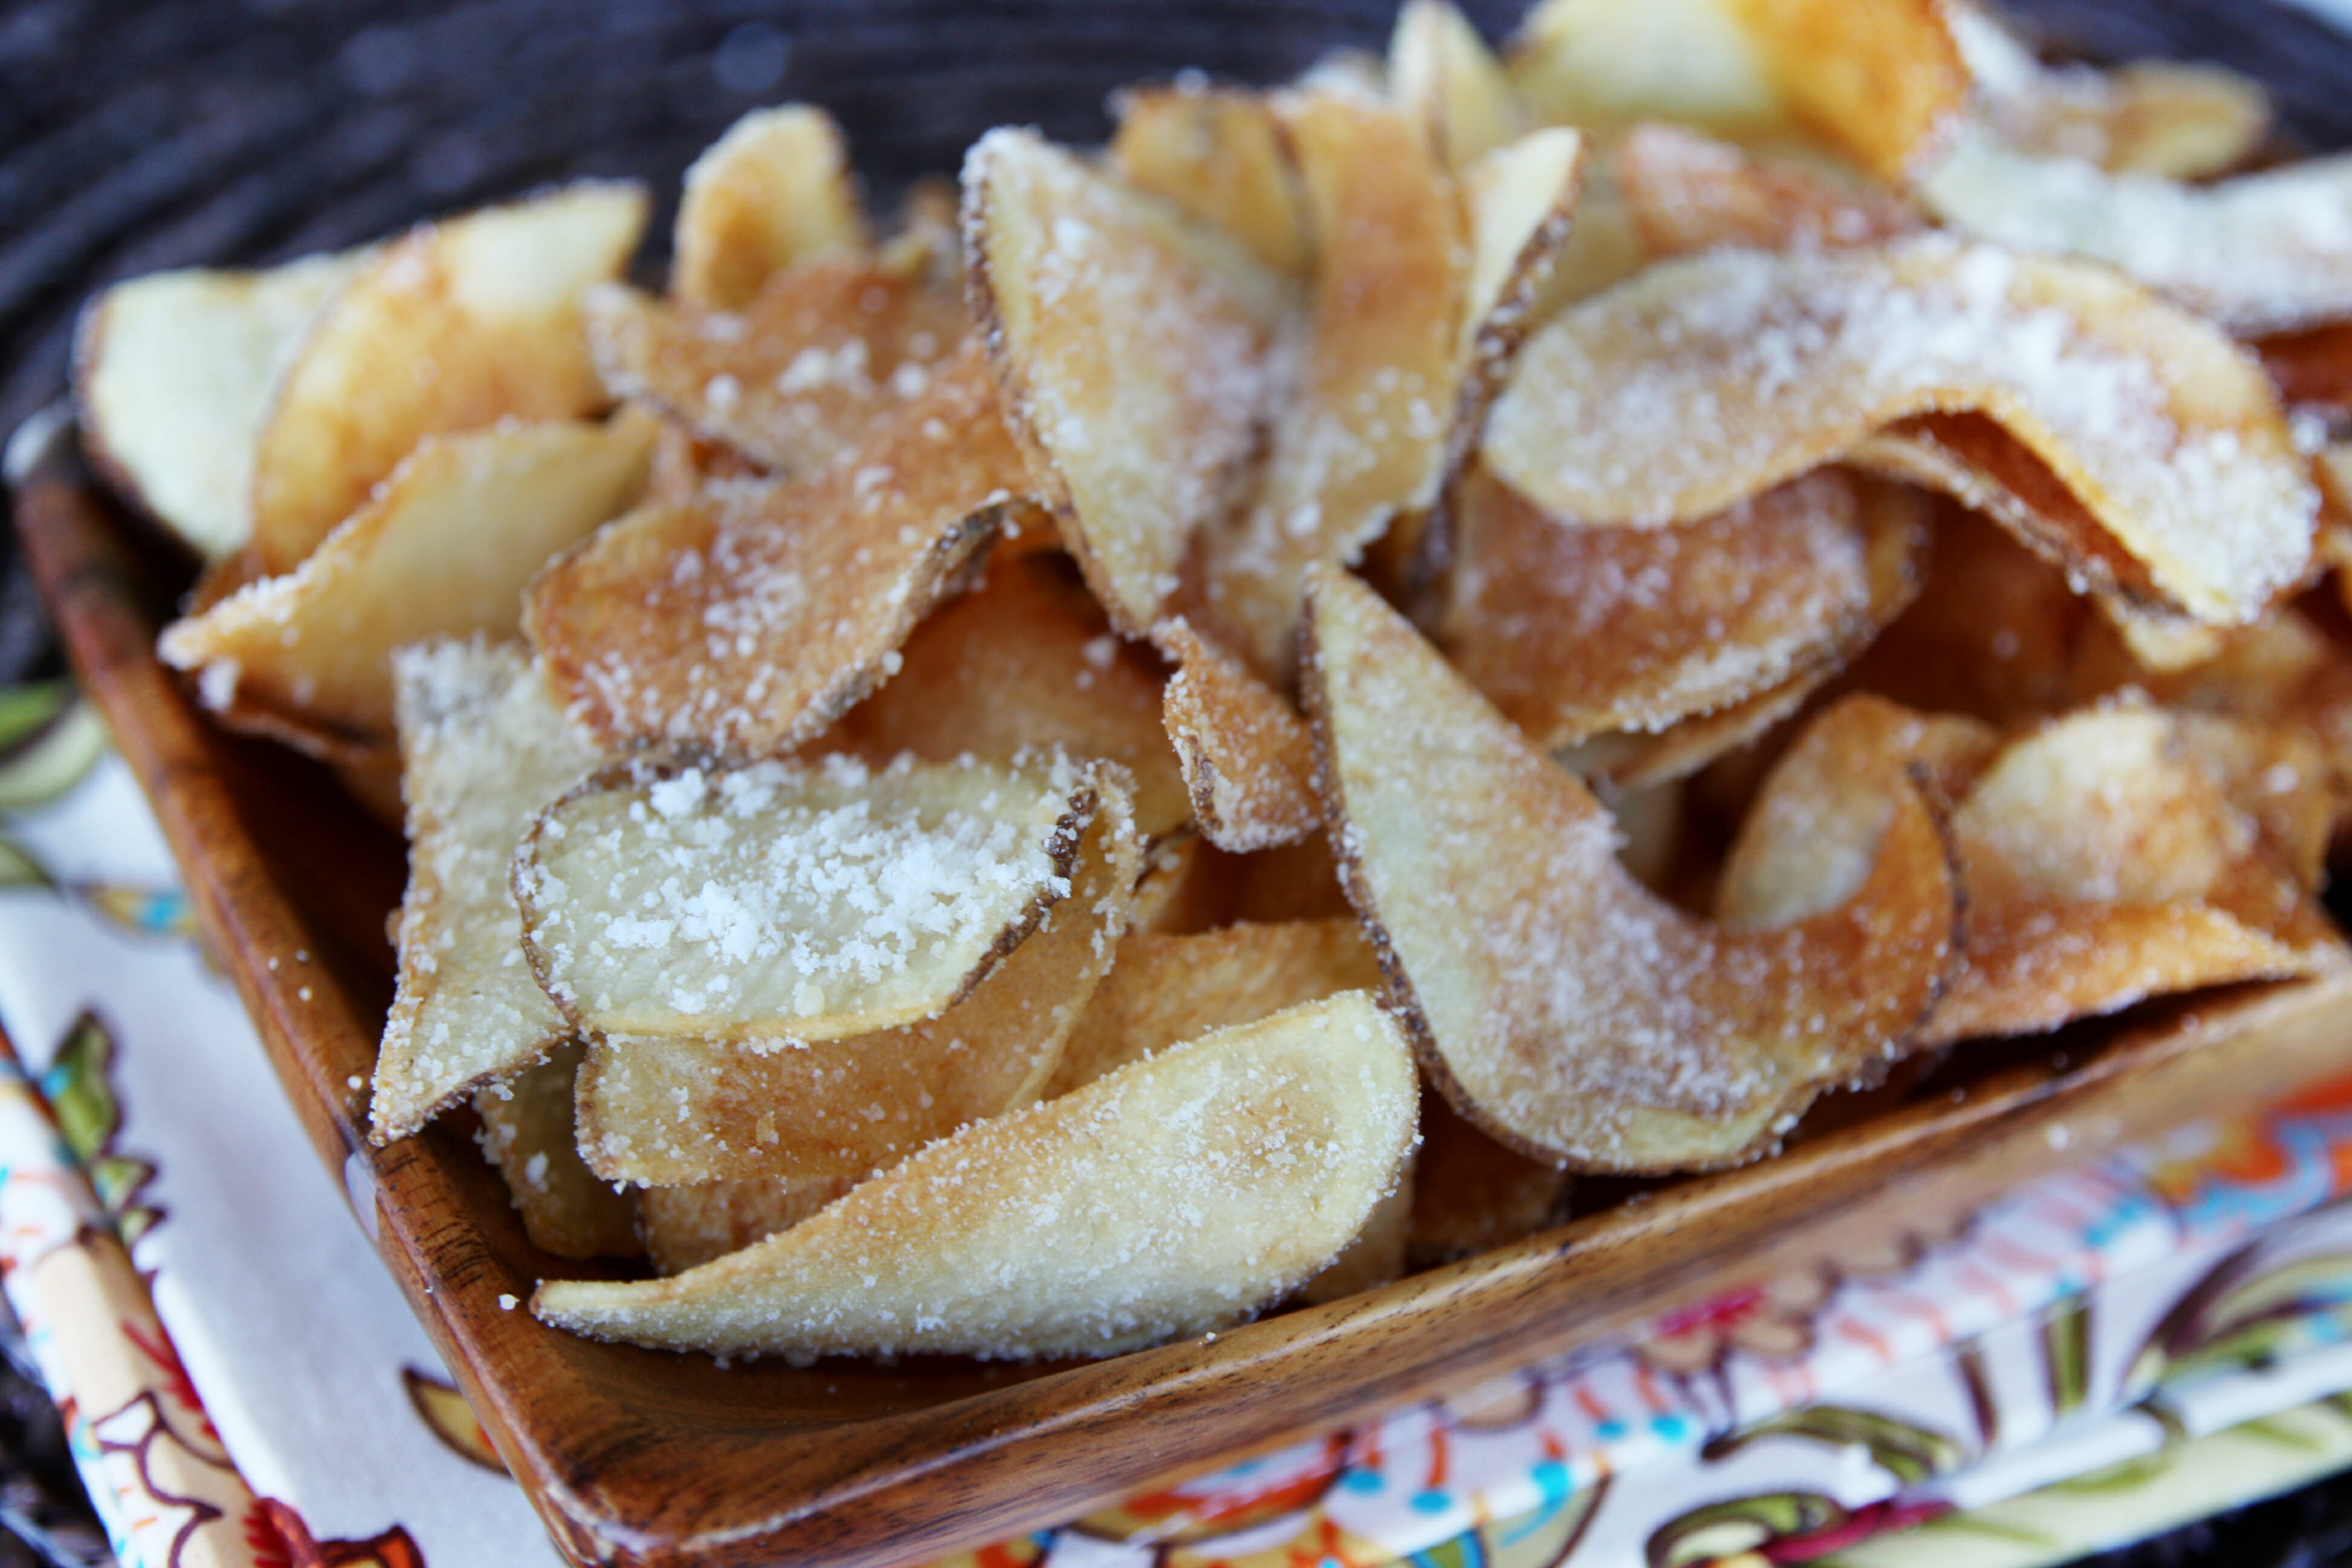 How To Make Homemade Potato Chips  Homemade Potato Chips Our Best Bites